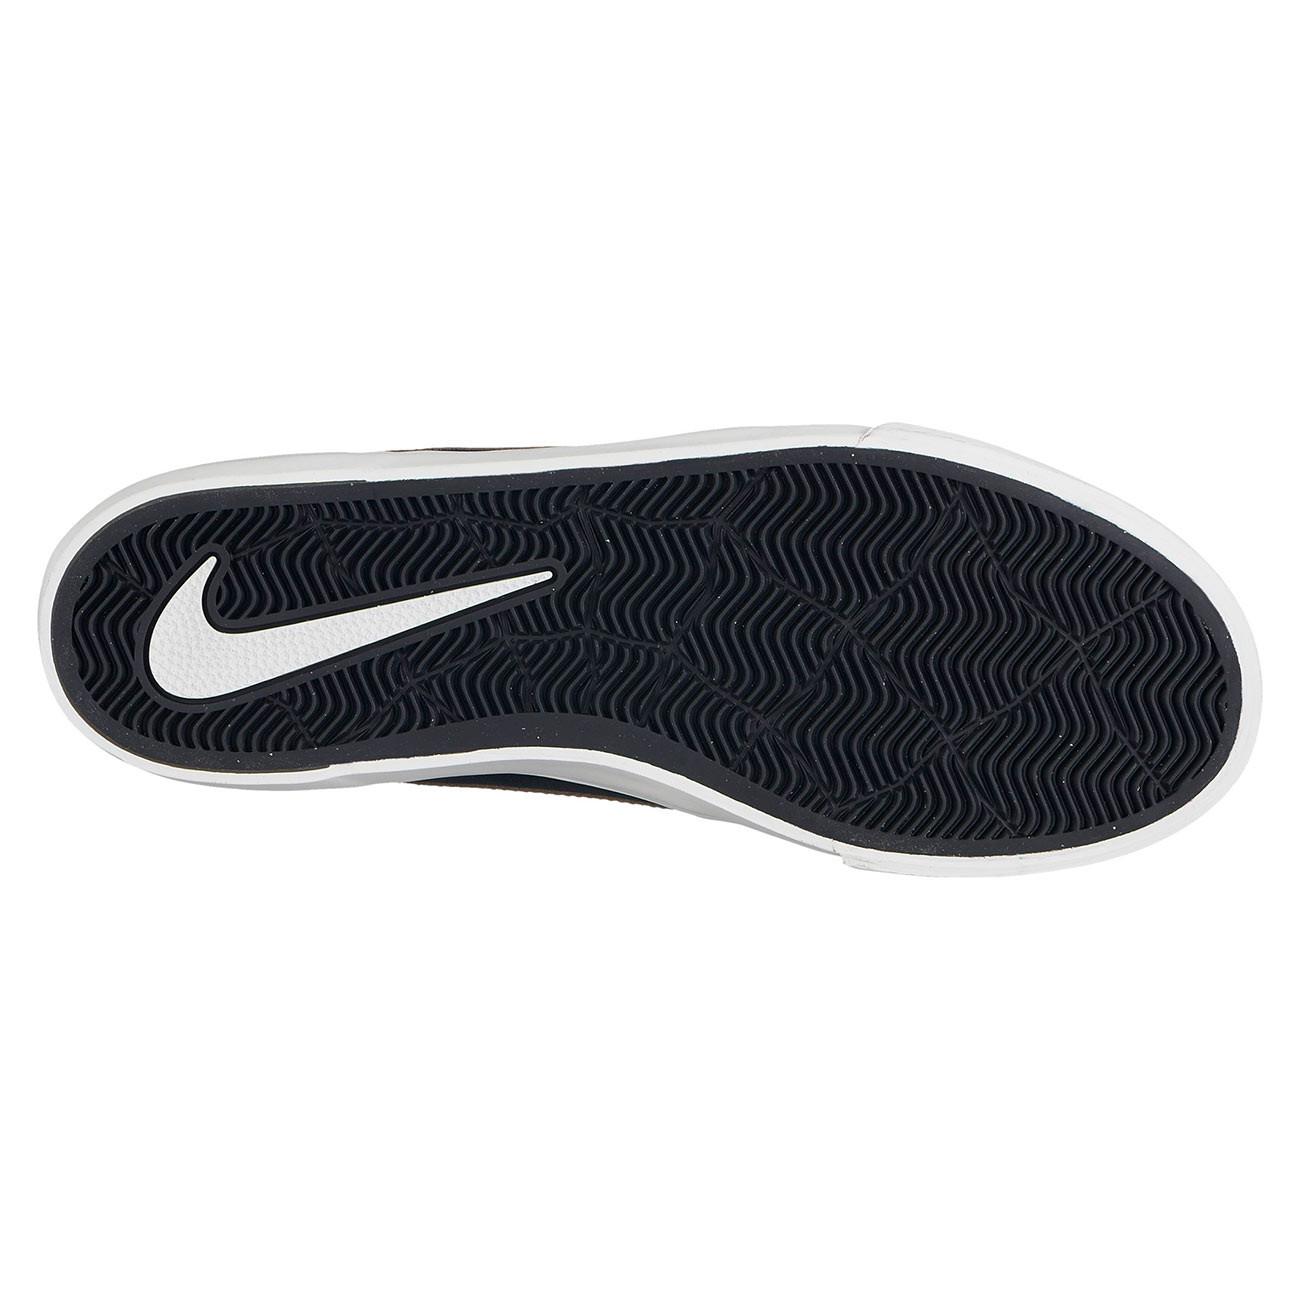 best service 7686a ed698 Sneakers Nike SB Hypervulc Eric Koston